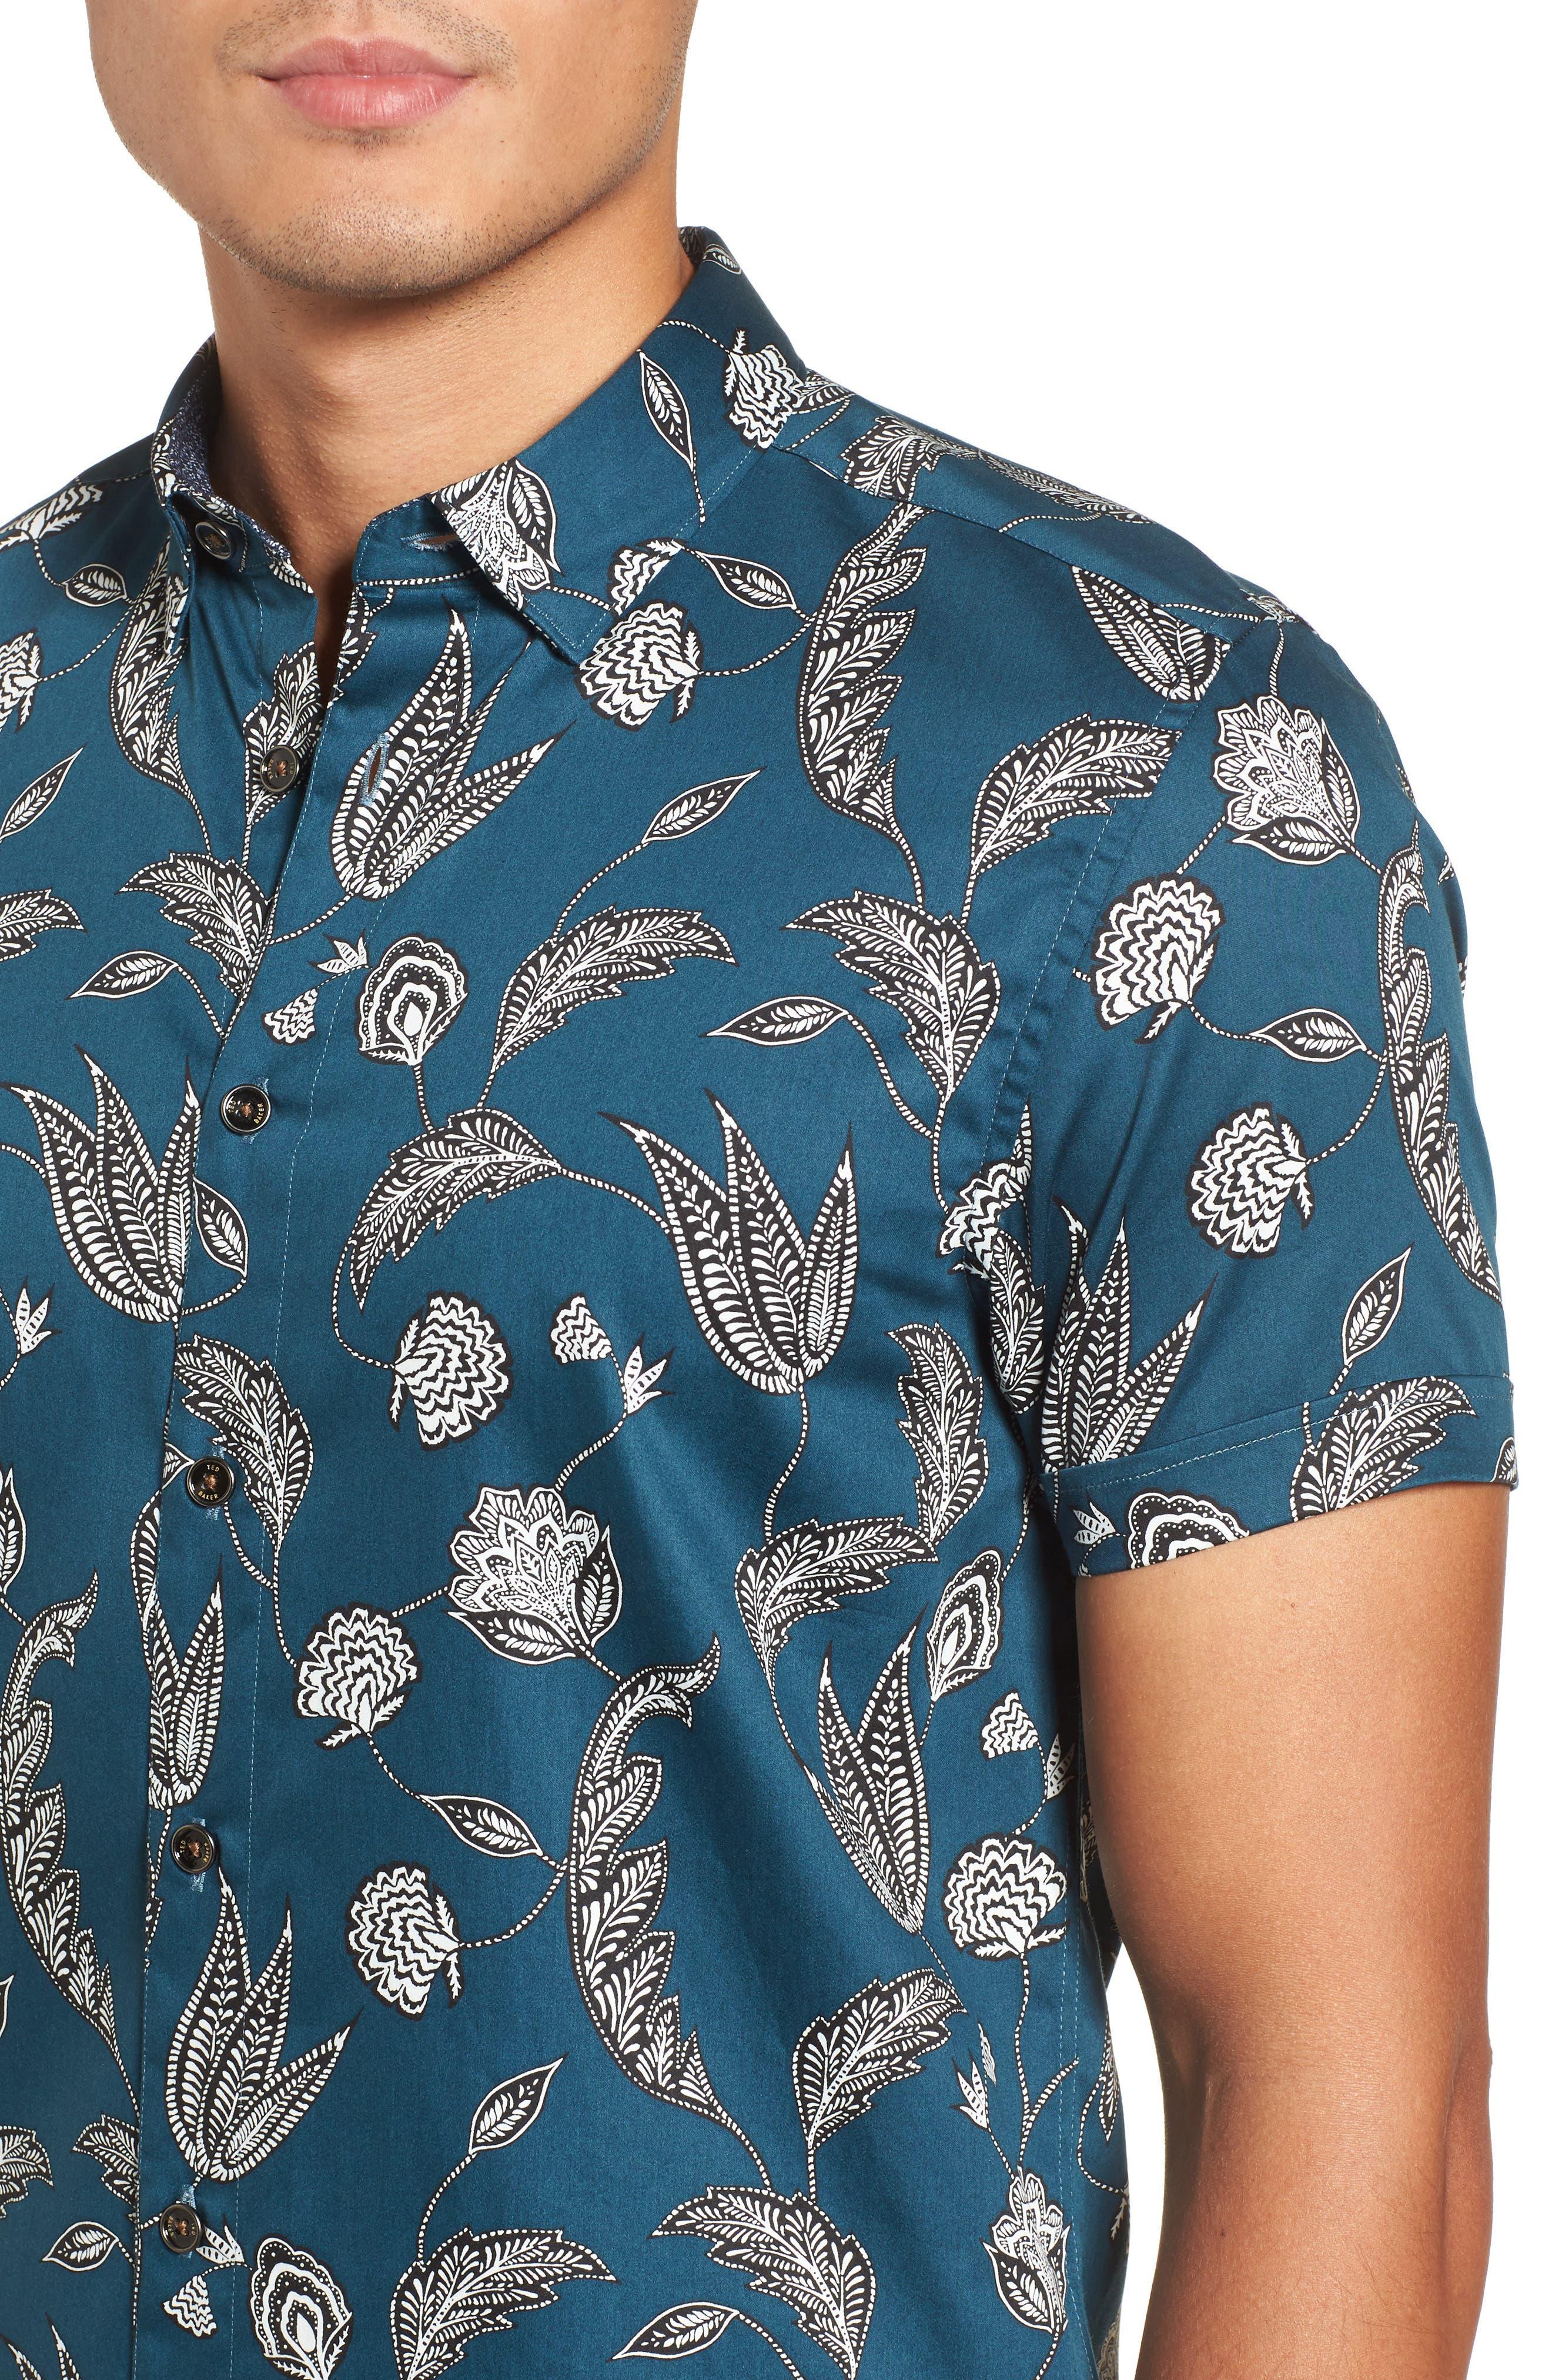 UTKU Floral Sport Shirt,                             Alternate thumbnail 7, color,